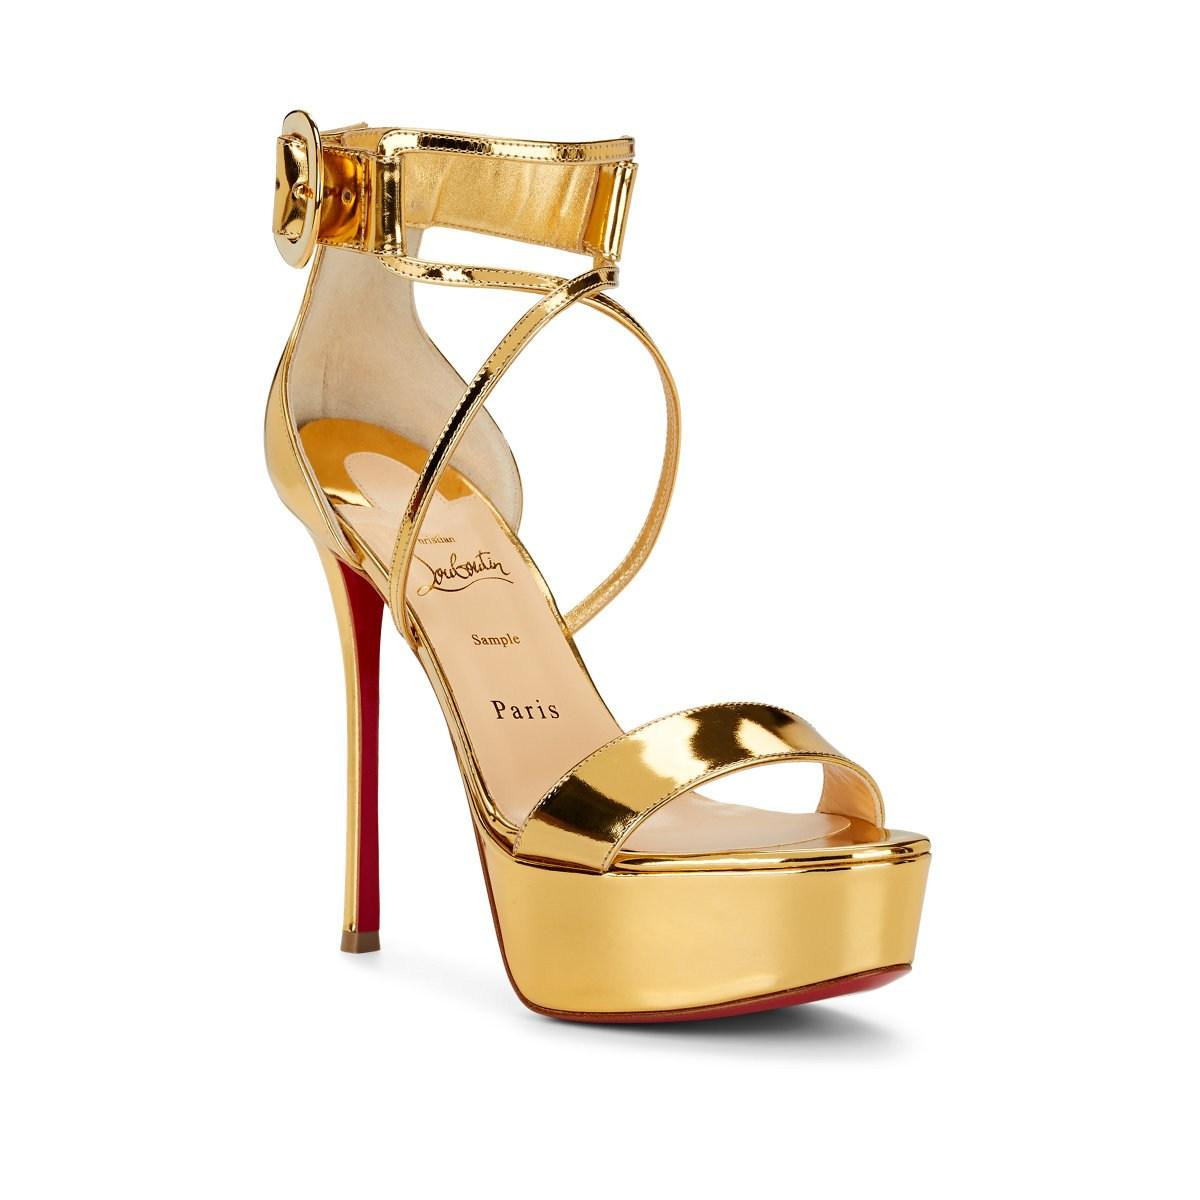 71b3a14f78245 Christian Louboutin - Metallic Choca Specchio Leather Platform Sandals -  Lyst. View fullscreen